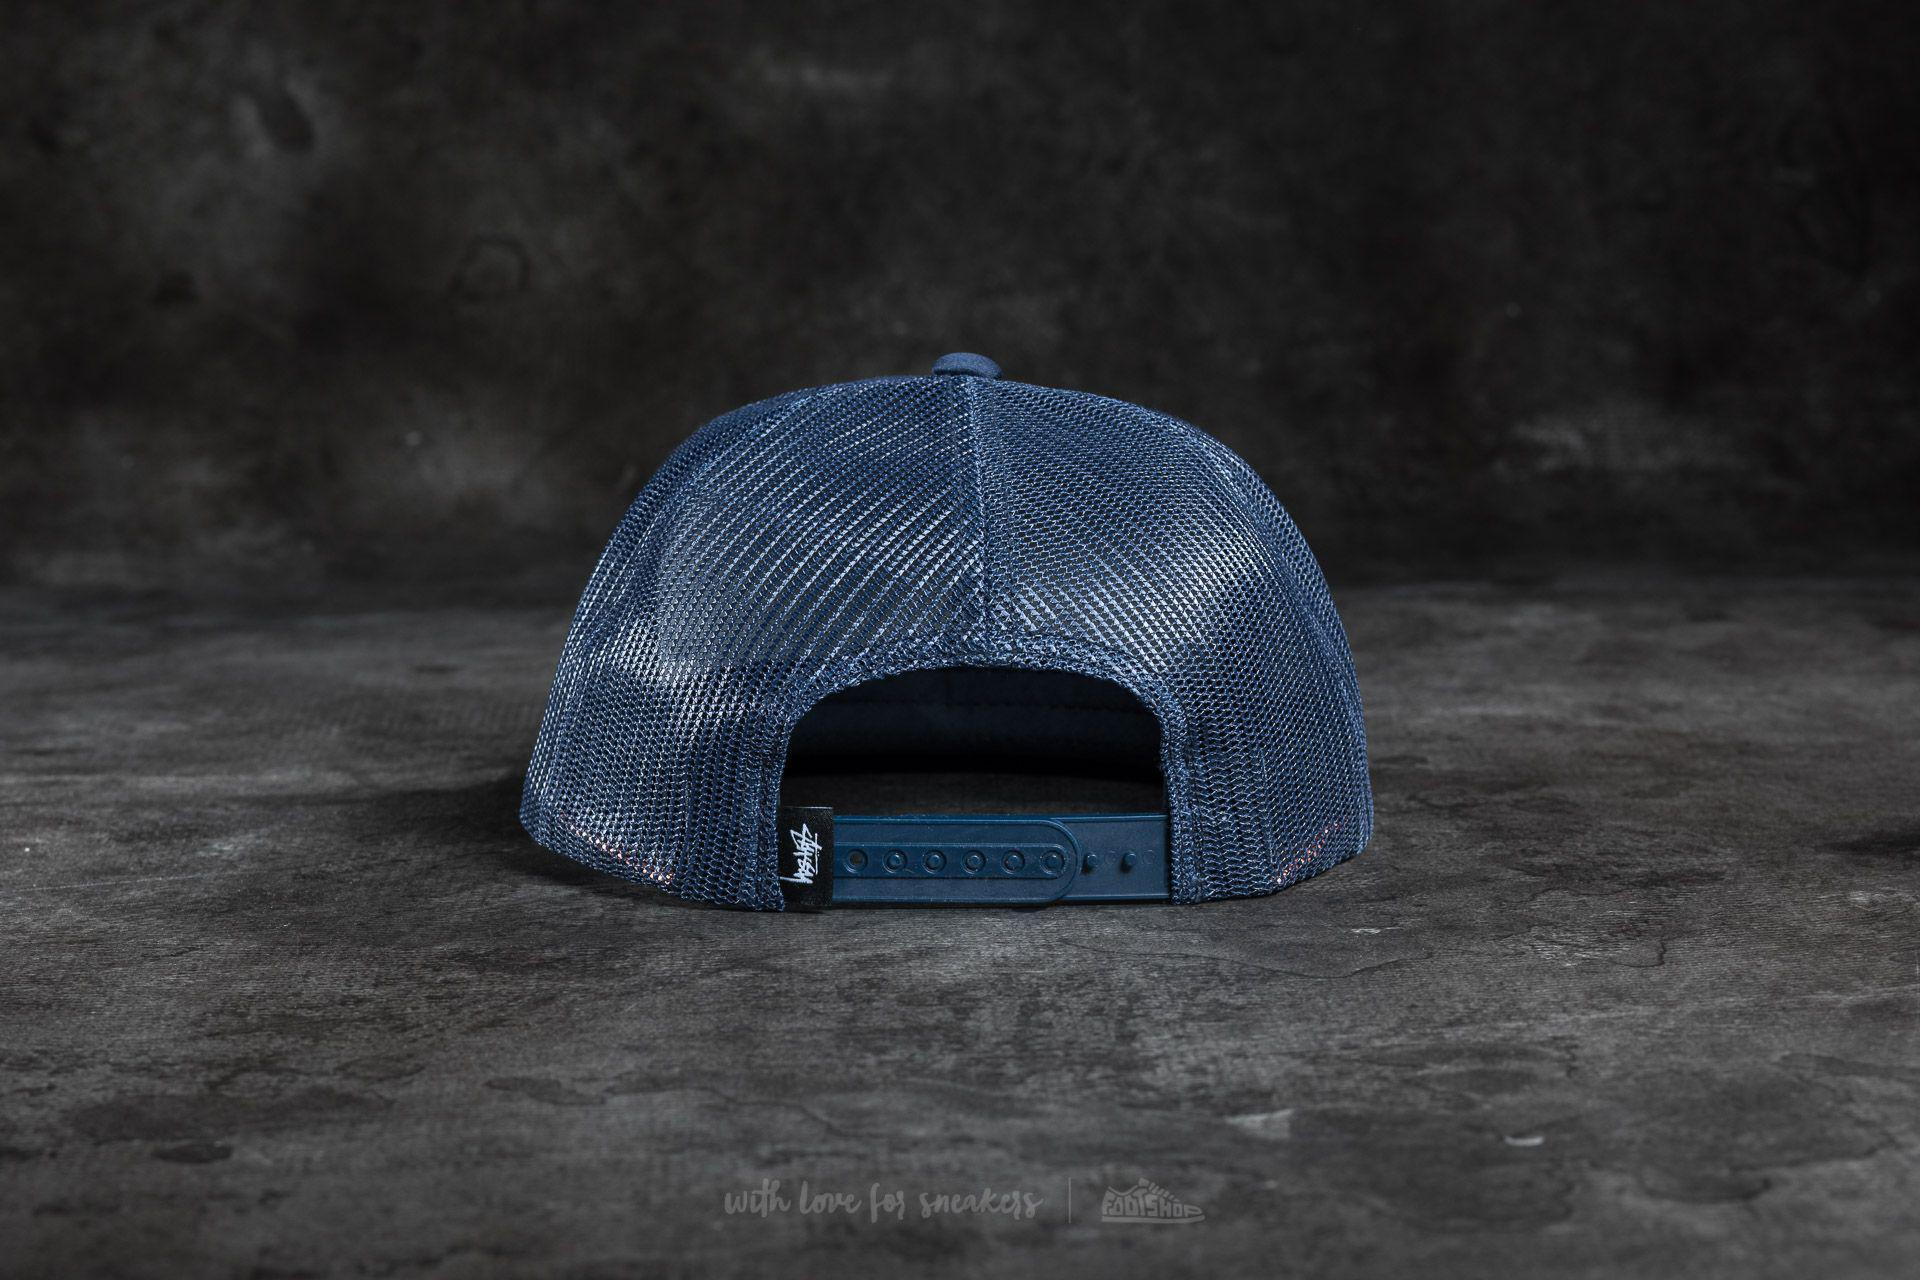 d5d5d9eb652 Lyst - Stussy Puff Print Stock Trucker Cap Navy in Blue for Men